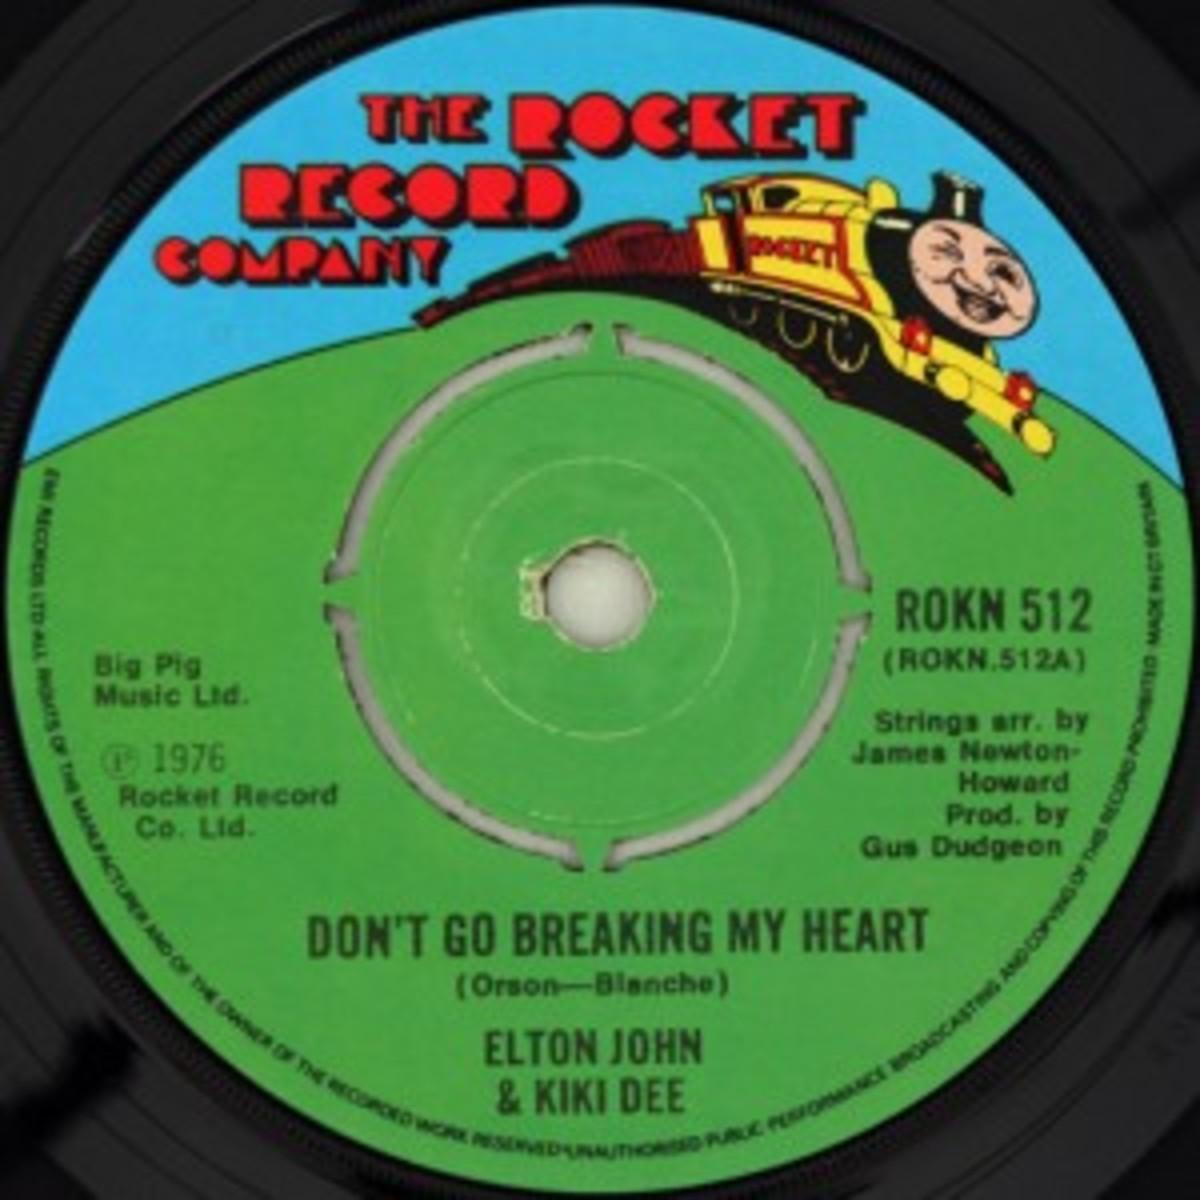 Don't Go Breaking My Heart Rocket Records Kiki Dee and Elton John